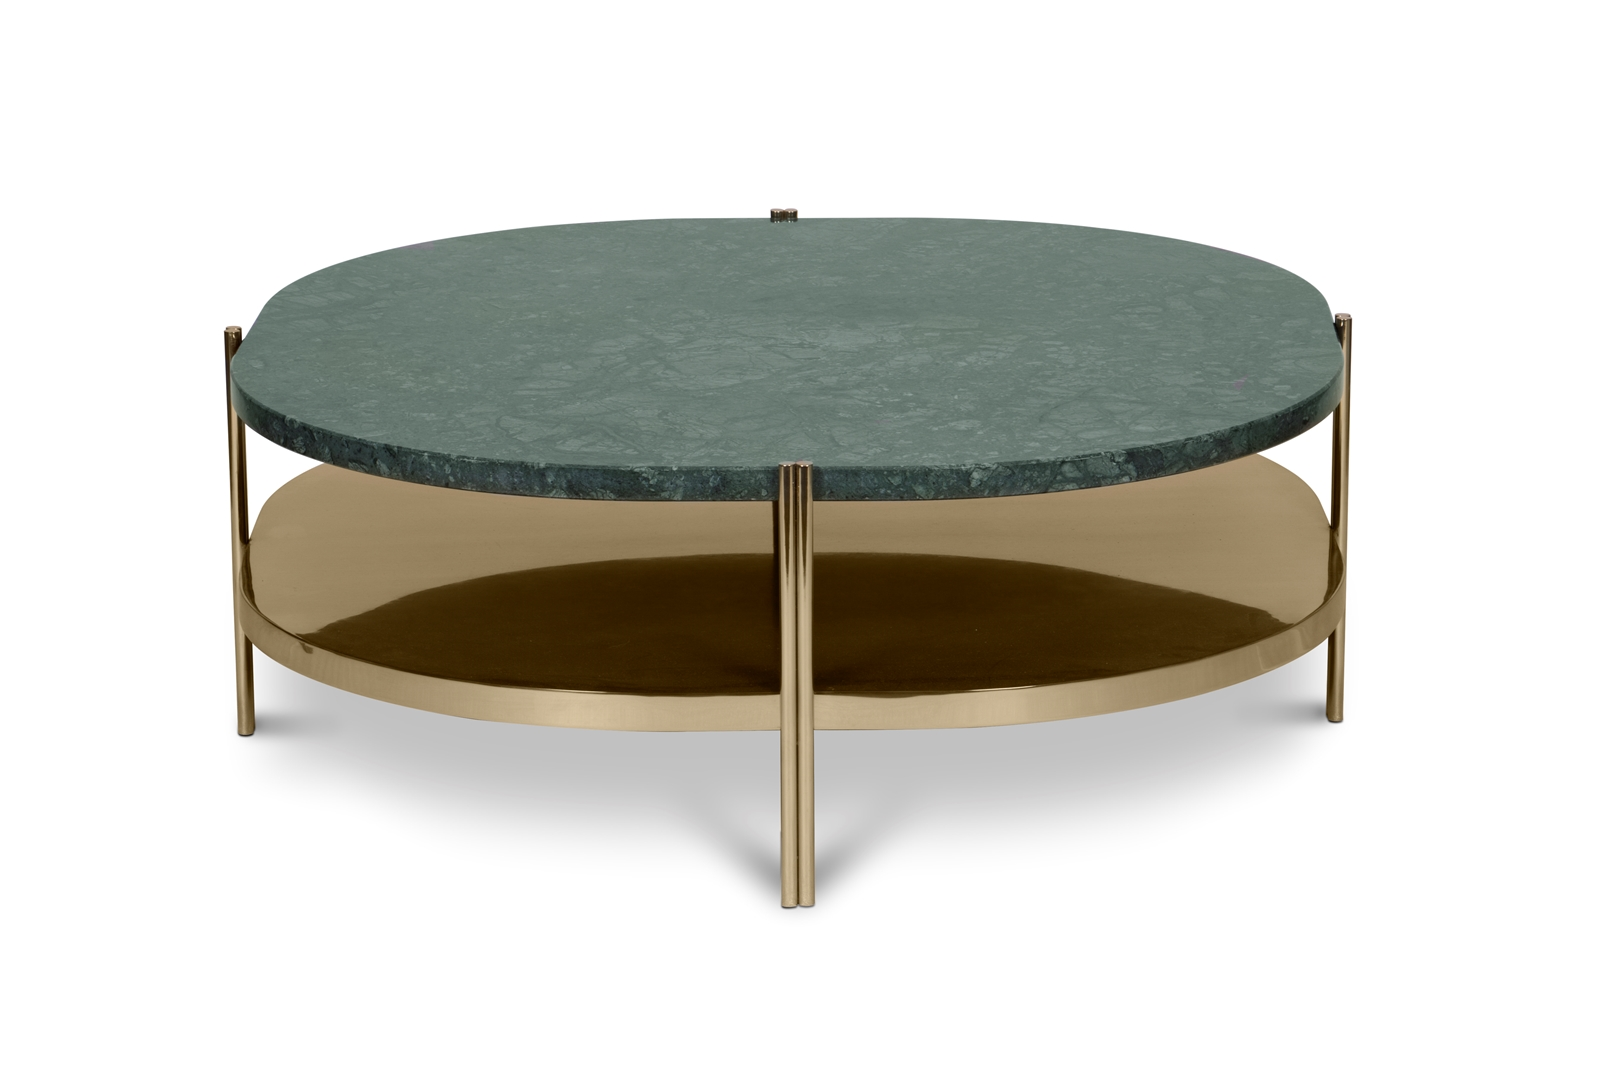 craig-center-table-02-HR (Copy)